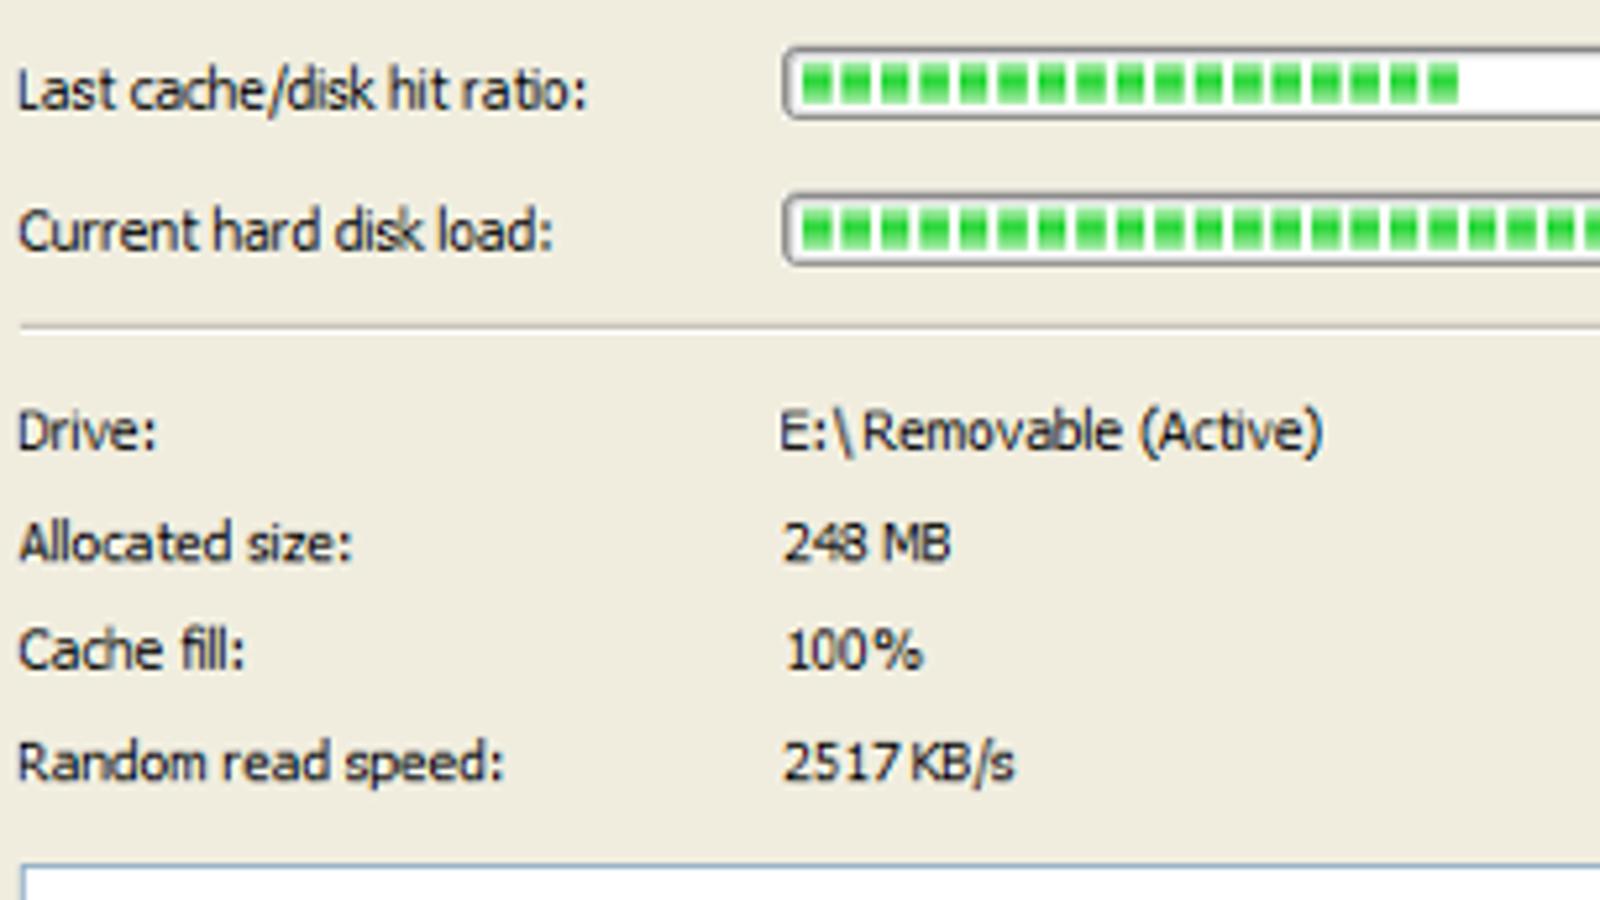 Eboostr 45 full crack both 32 and 64 bit download.